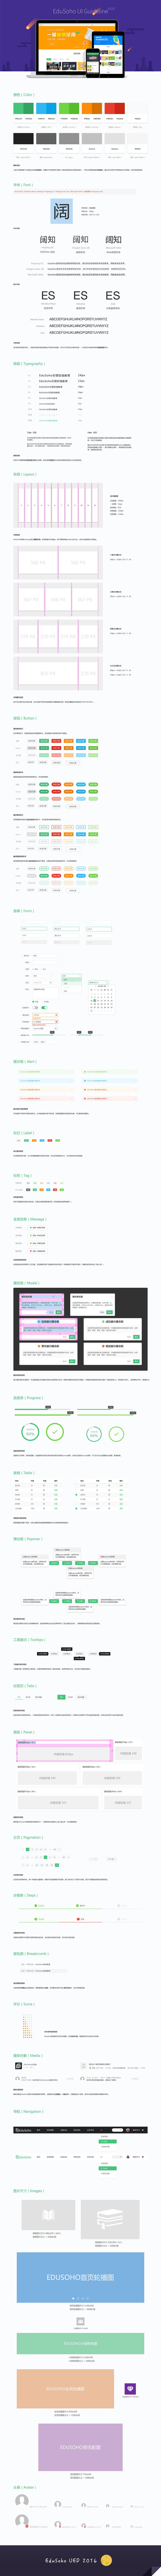 EduSoho UI 设计规范(Web版)